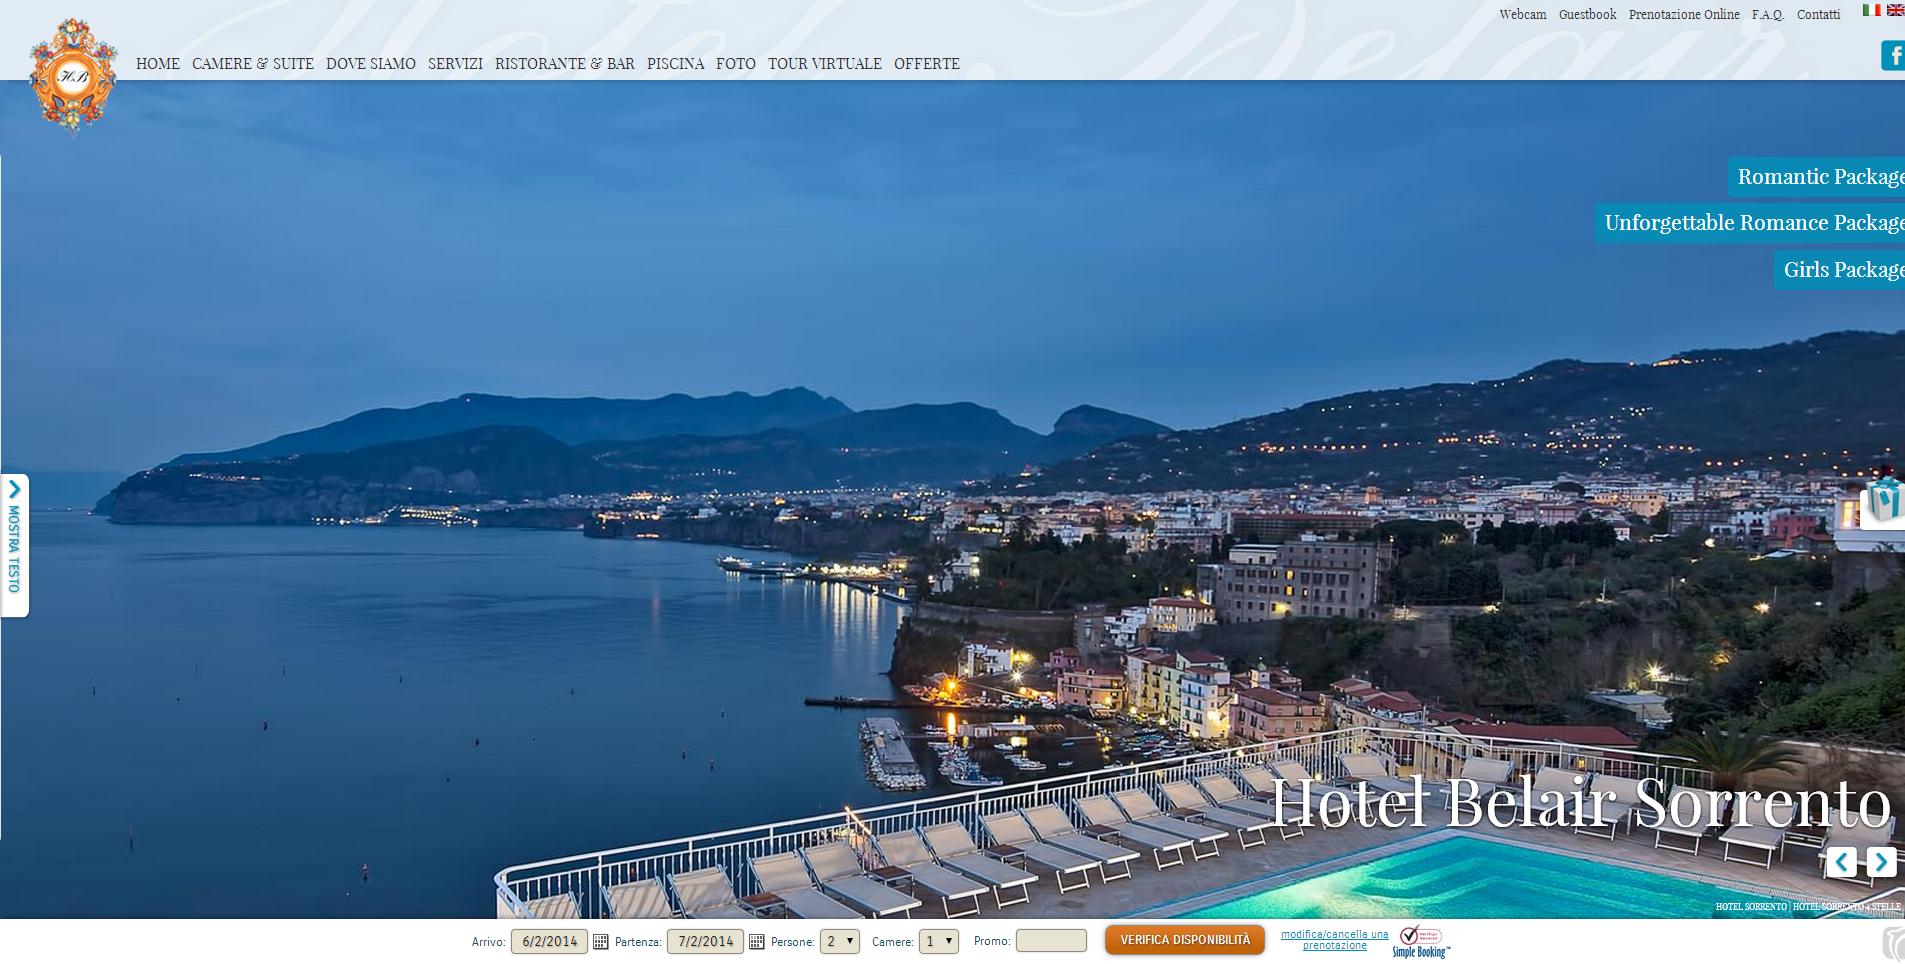 www.belair.it/ - Luxury Hotel in Sorrento, overlooking the stunning Sorrento Coast.